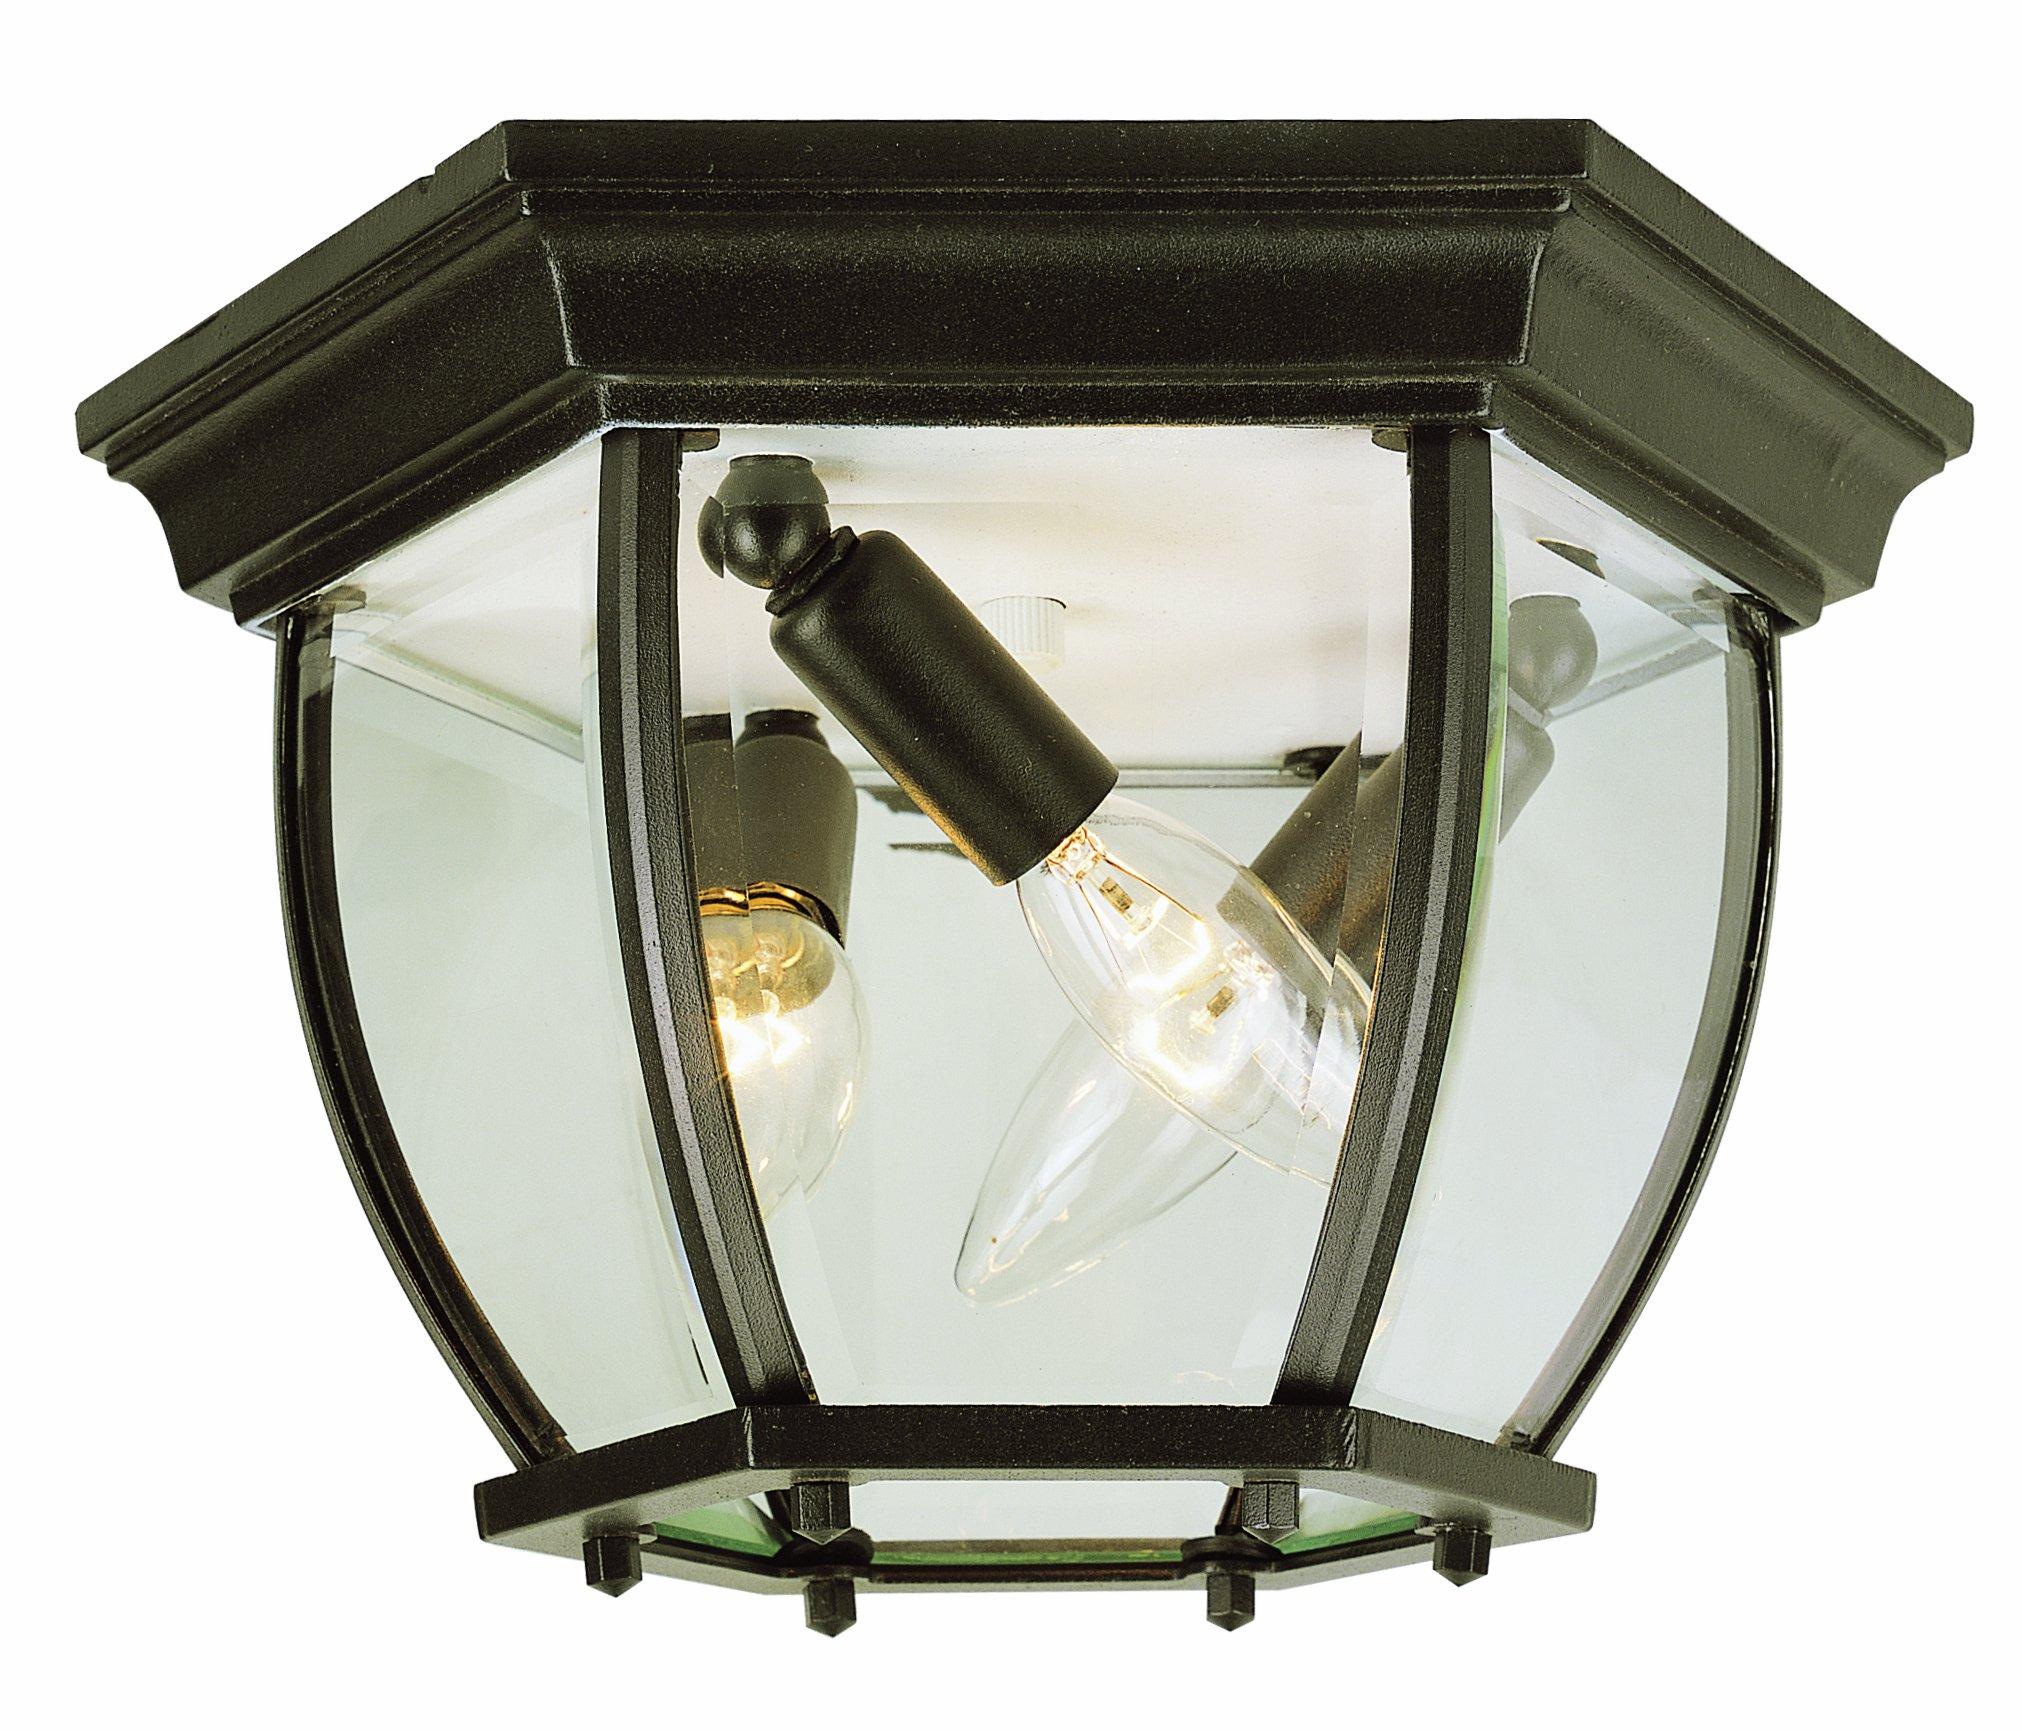 Trans Globe Lighting 4906 WH Outdoor Angelus 6.5'' Flushmount Lantern, White